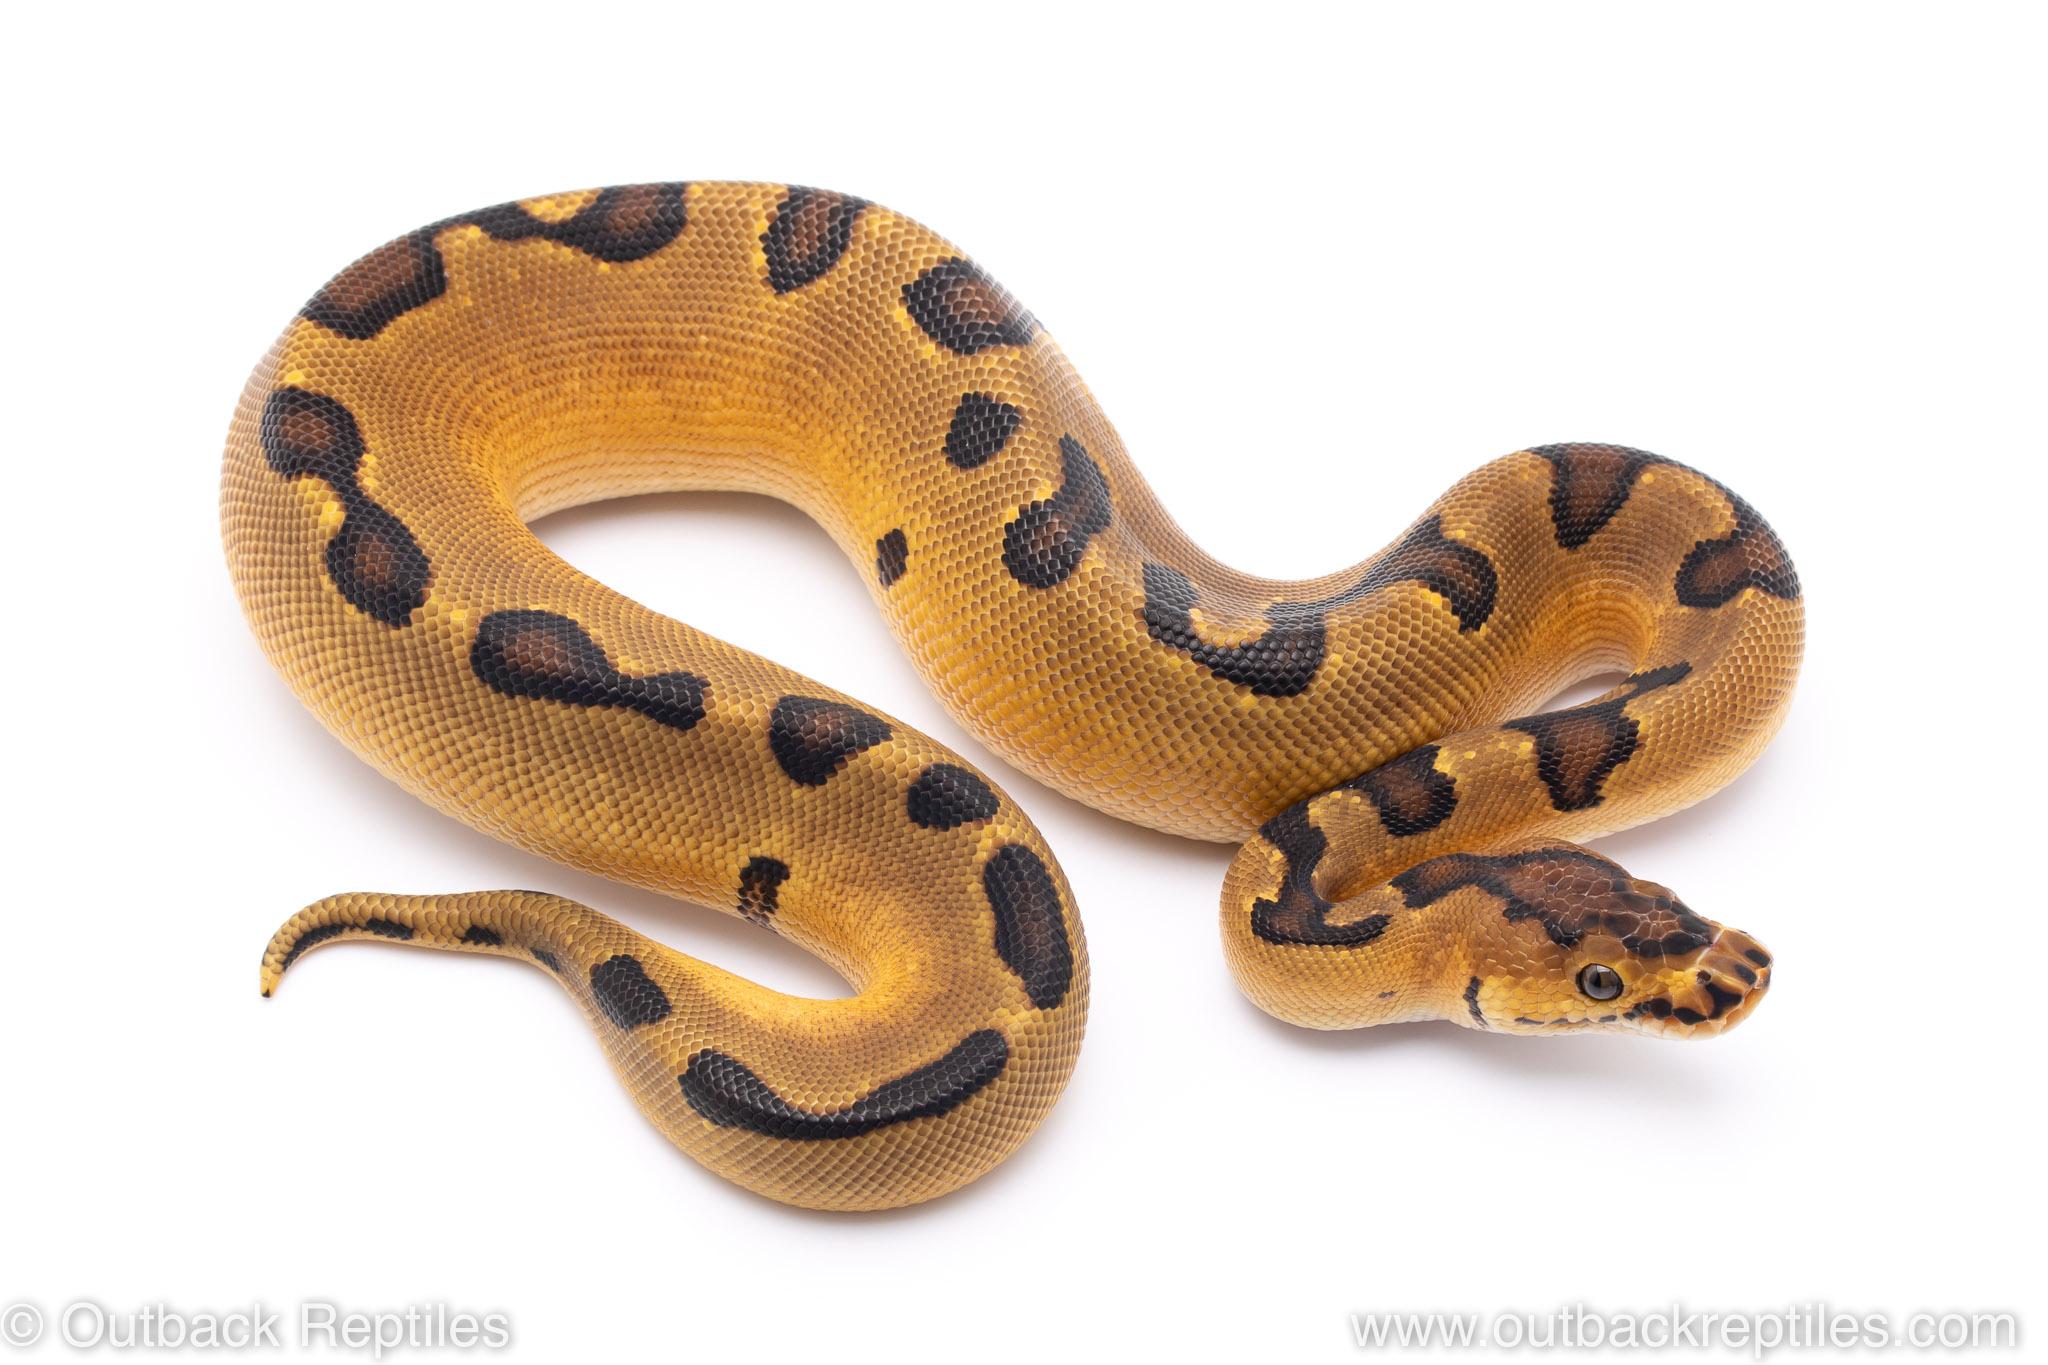 Orange Dream Enchi Clown ball python for sale